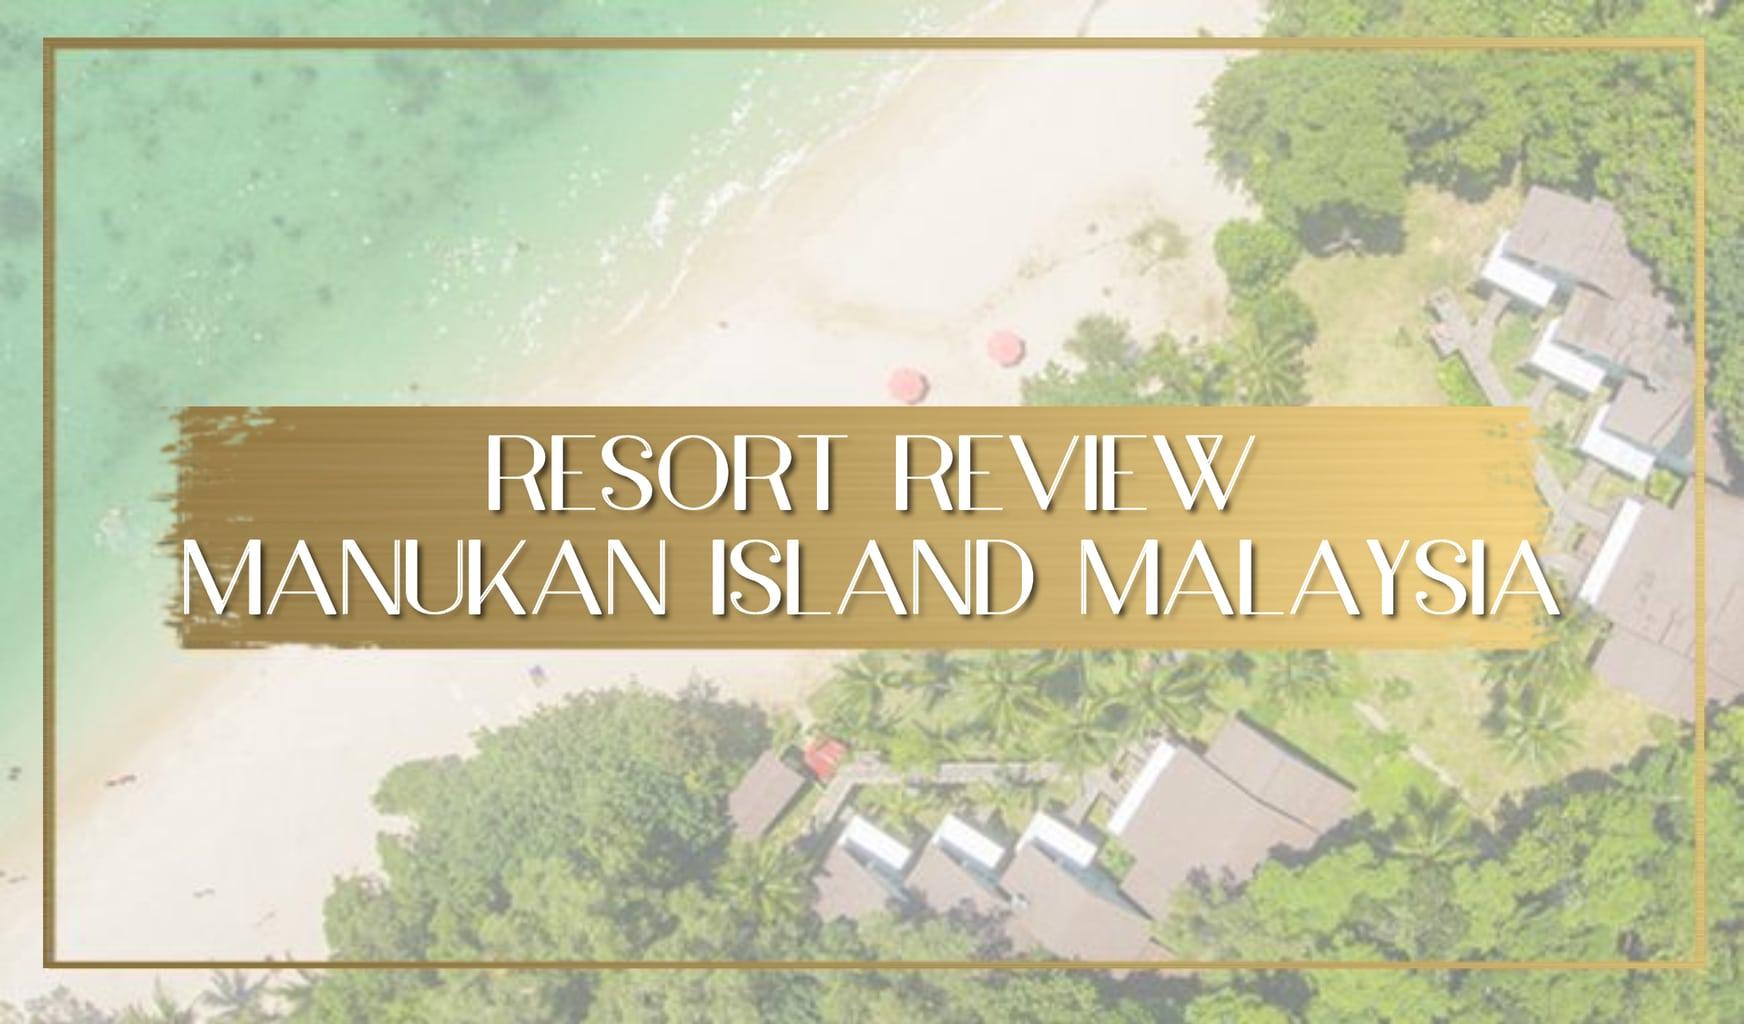 Manukan Island Resort review Malaysia main